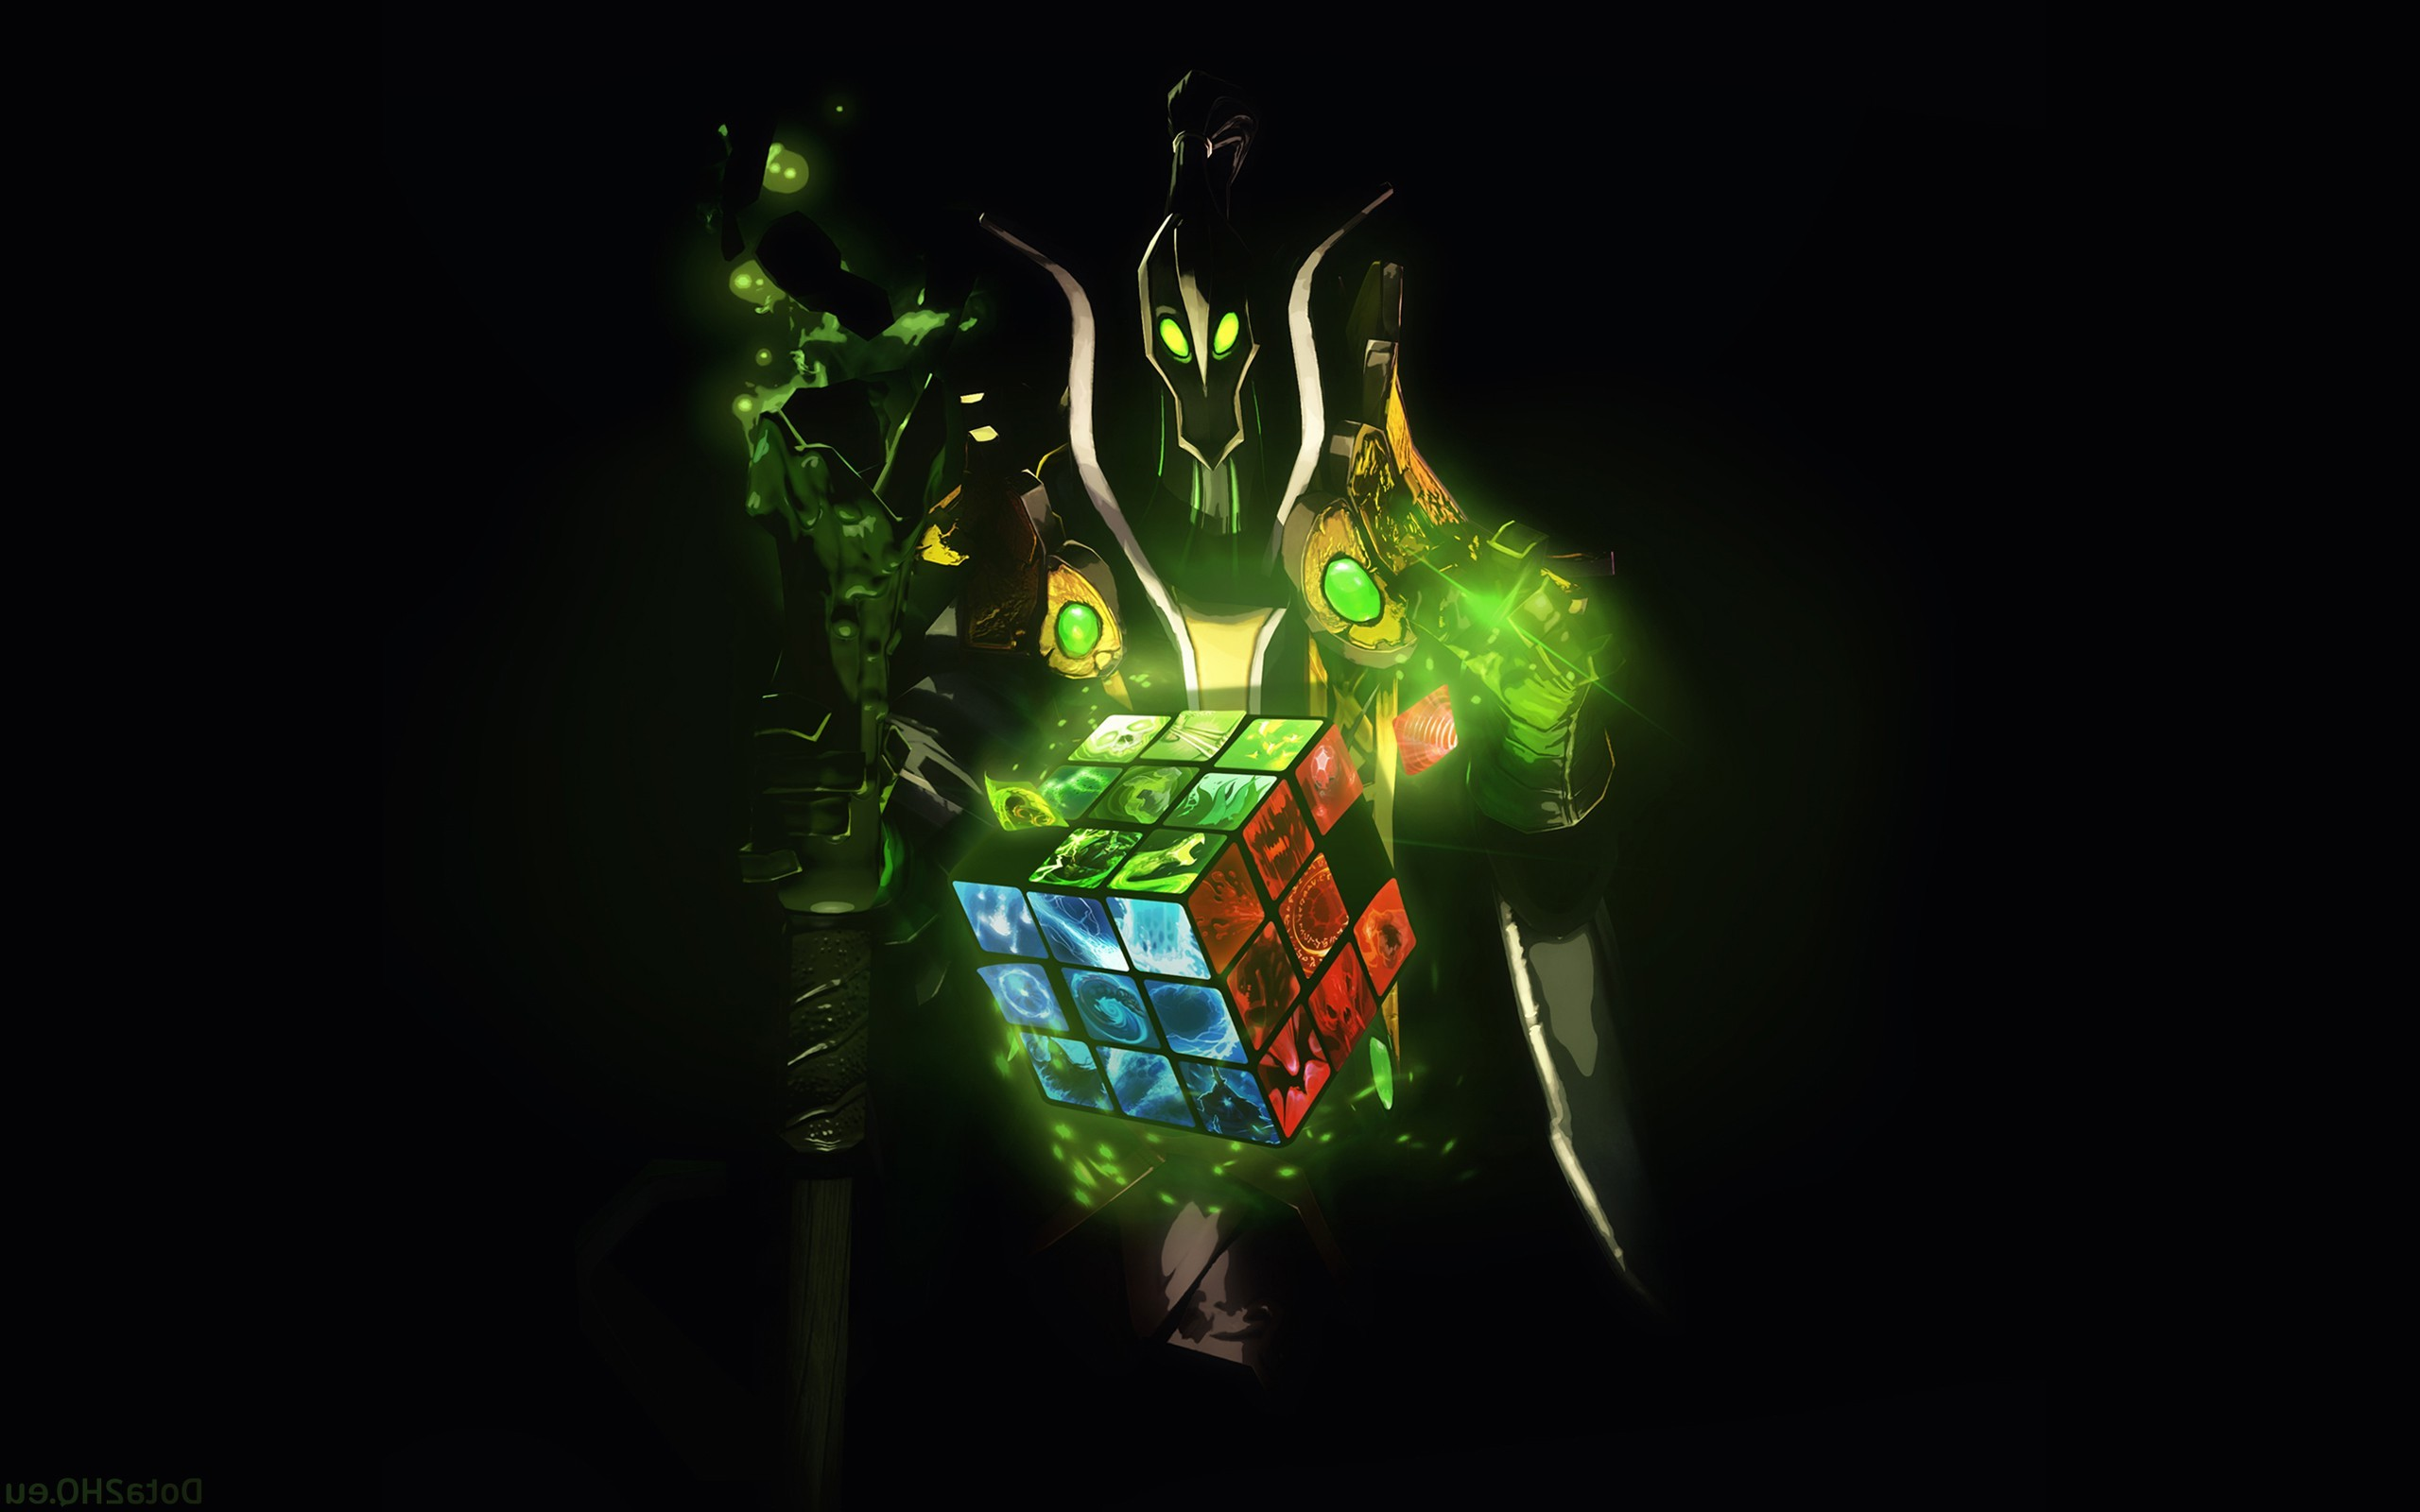 Wallpaper 2560x1600 Px Dota 2 Rubick The Grand Magus